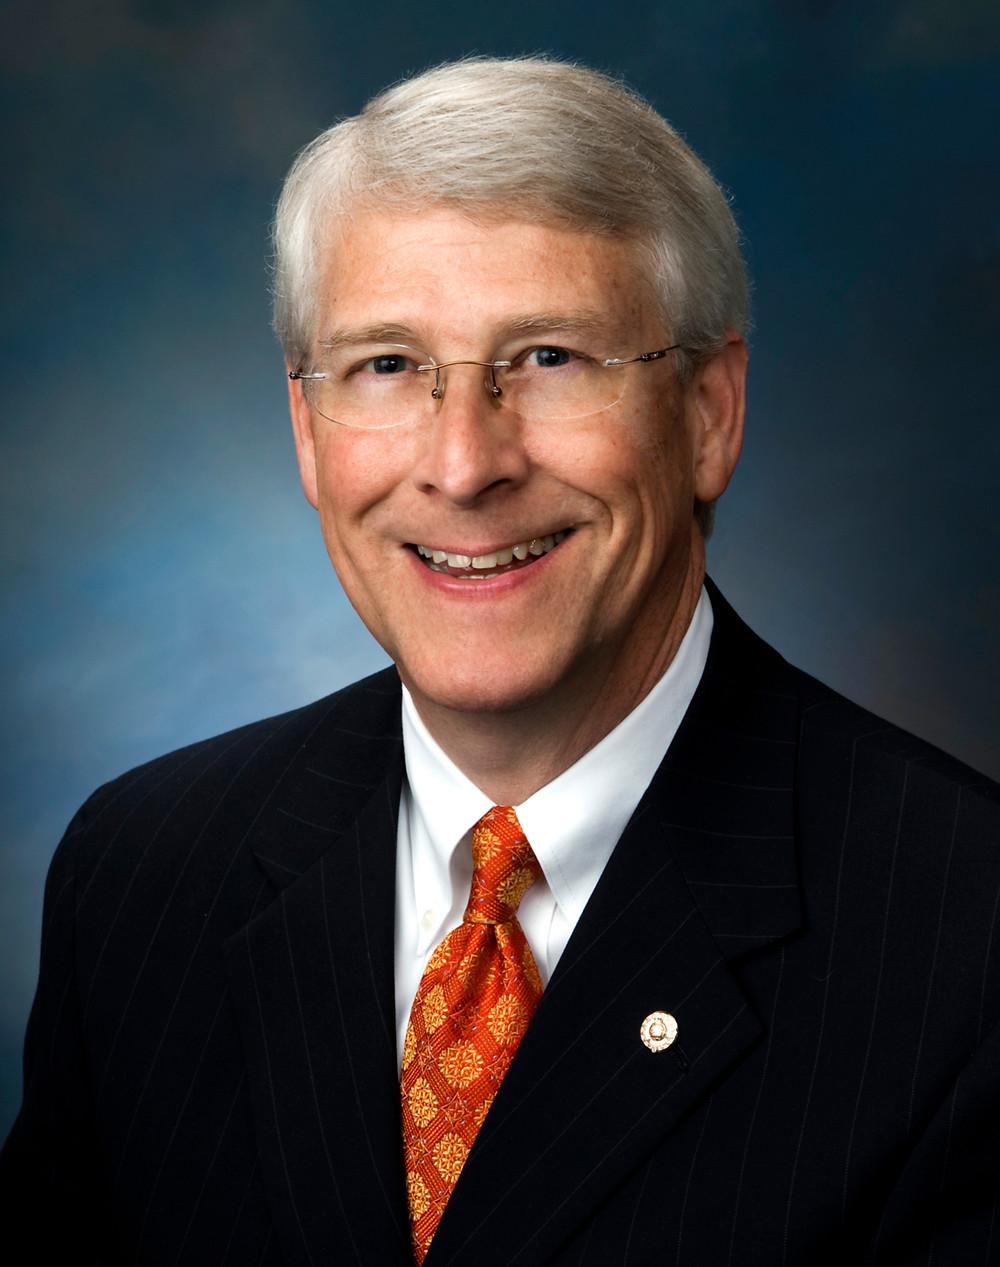 SenatorRogerWicker(R-MS).jpg